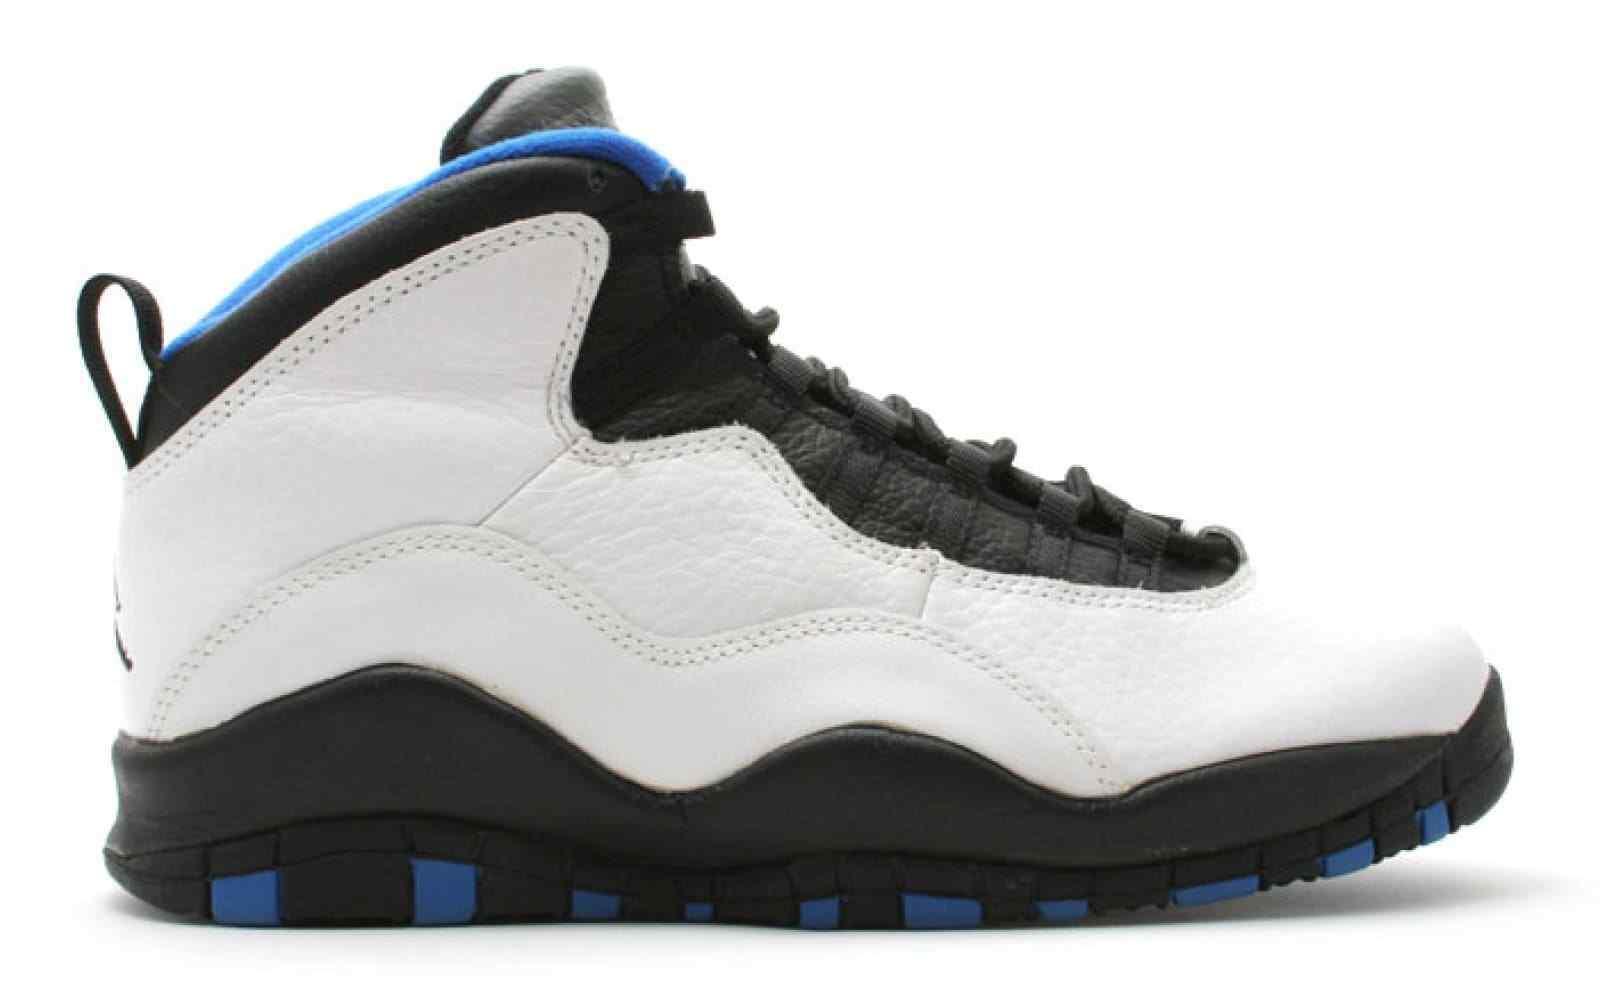 Uomo Uomo Uomo Nike Air Jordan Retro 10  Orlando  Athletic Fashion scarpe da ginnastica 310805 108 f25be0